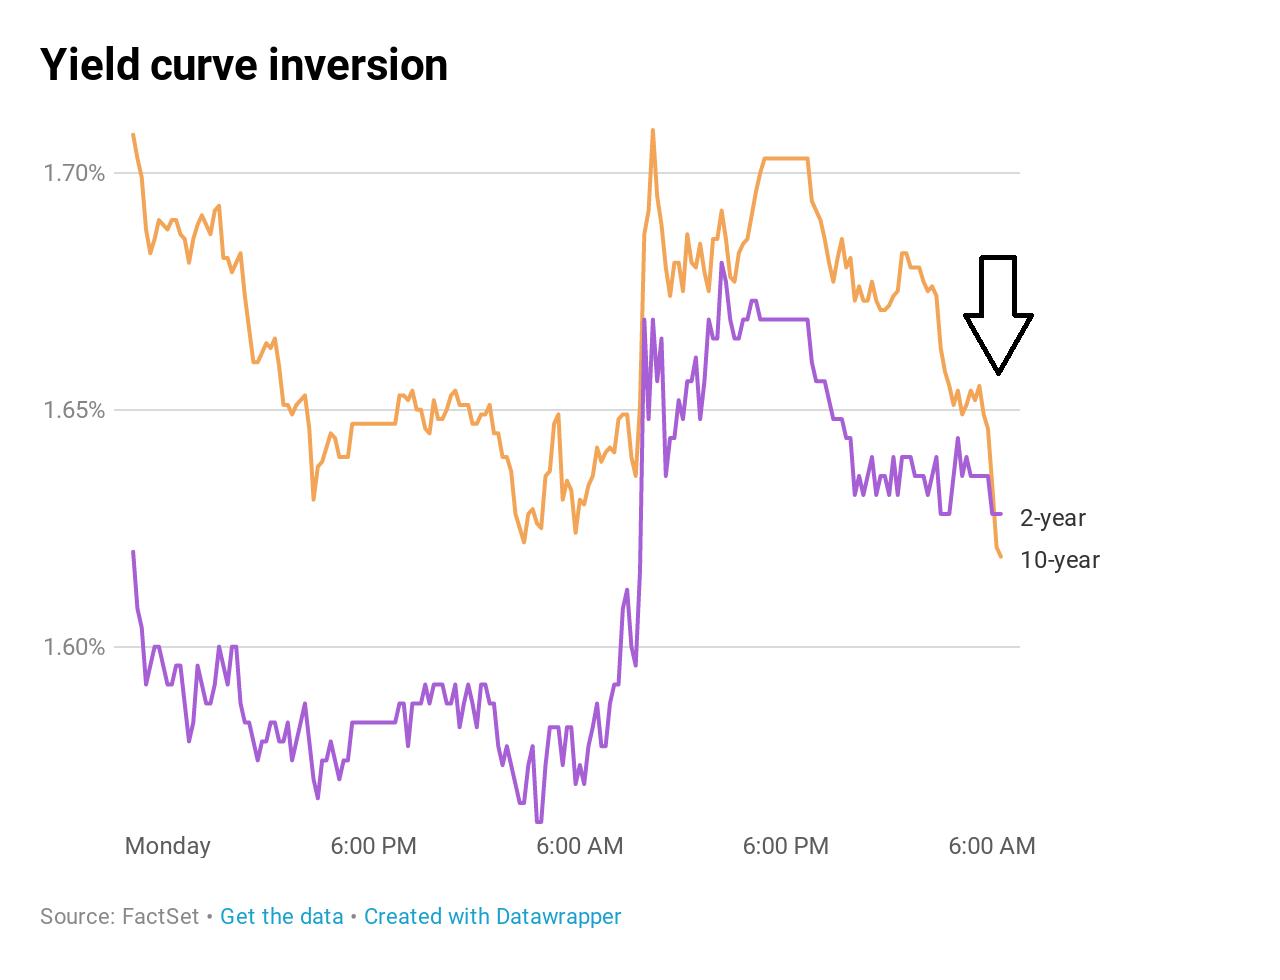 Dow Jones 800 puan düştü, piyasalarda resesyon paniği